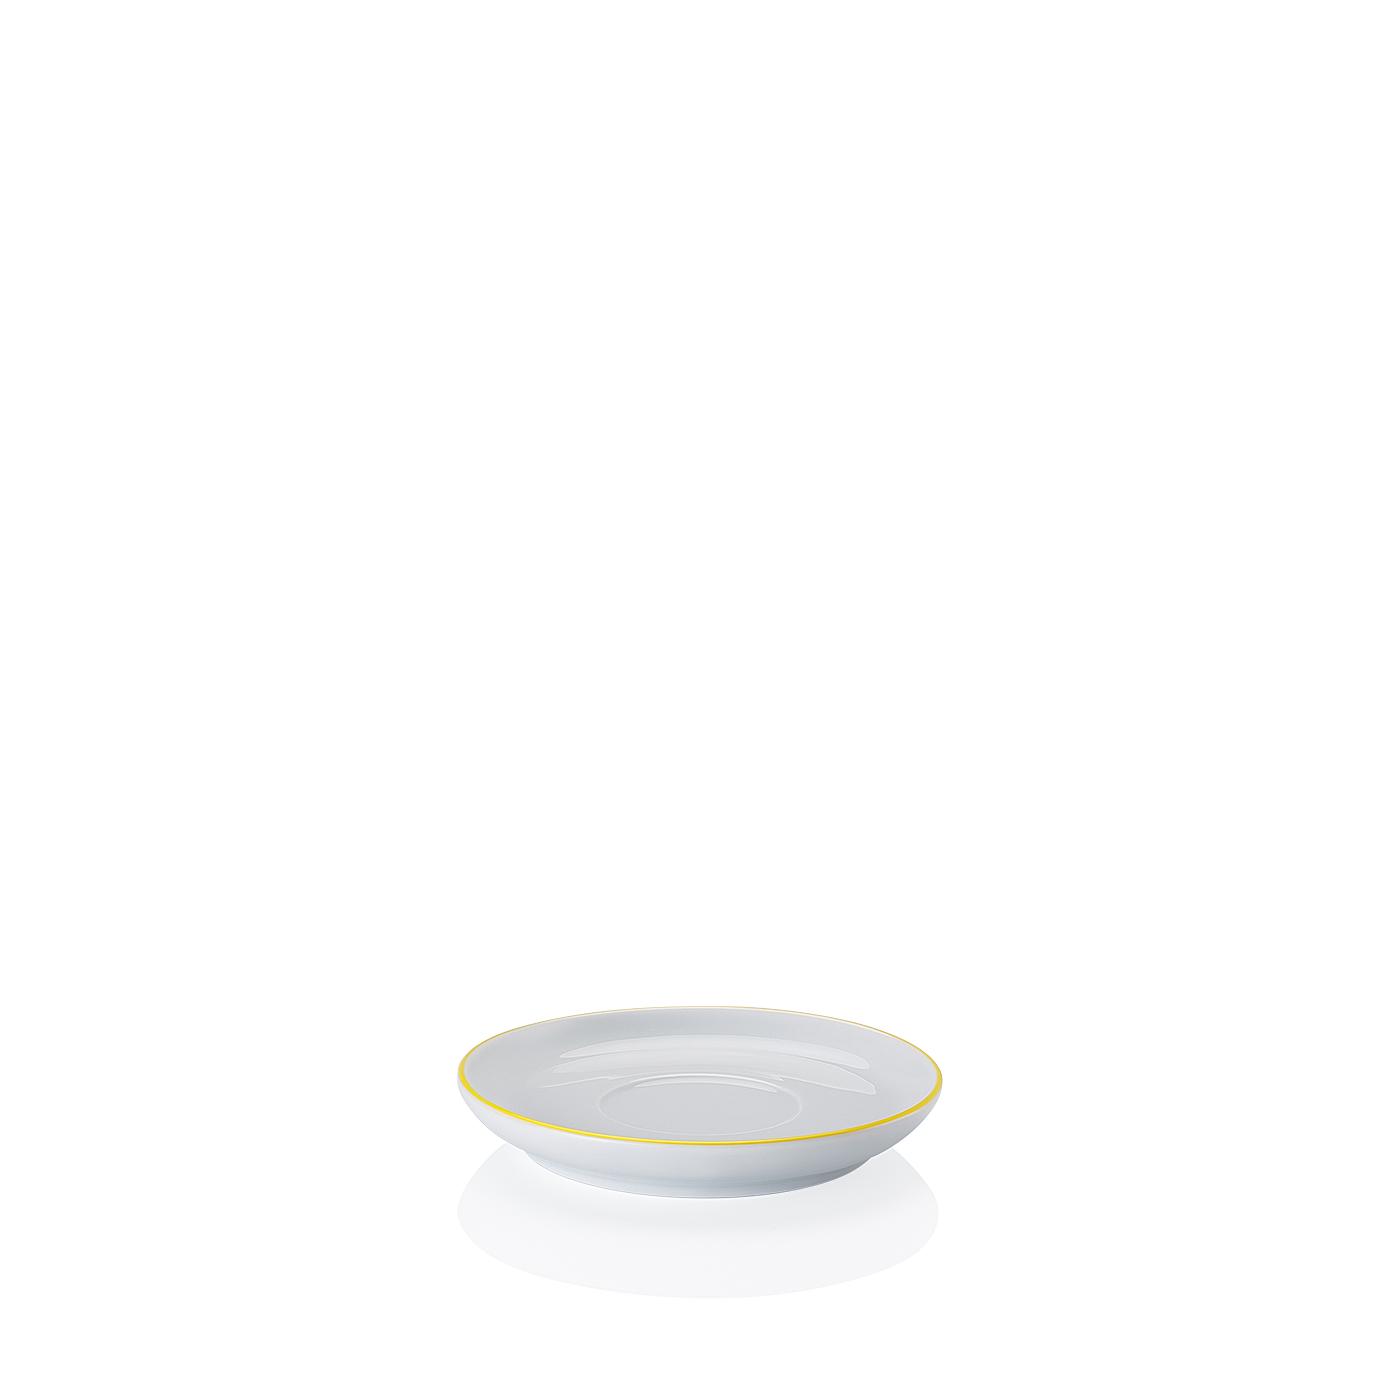 Espresso-Untertasse Cucina-Basic Colori Yellow Arzberg